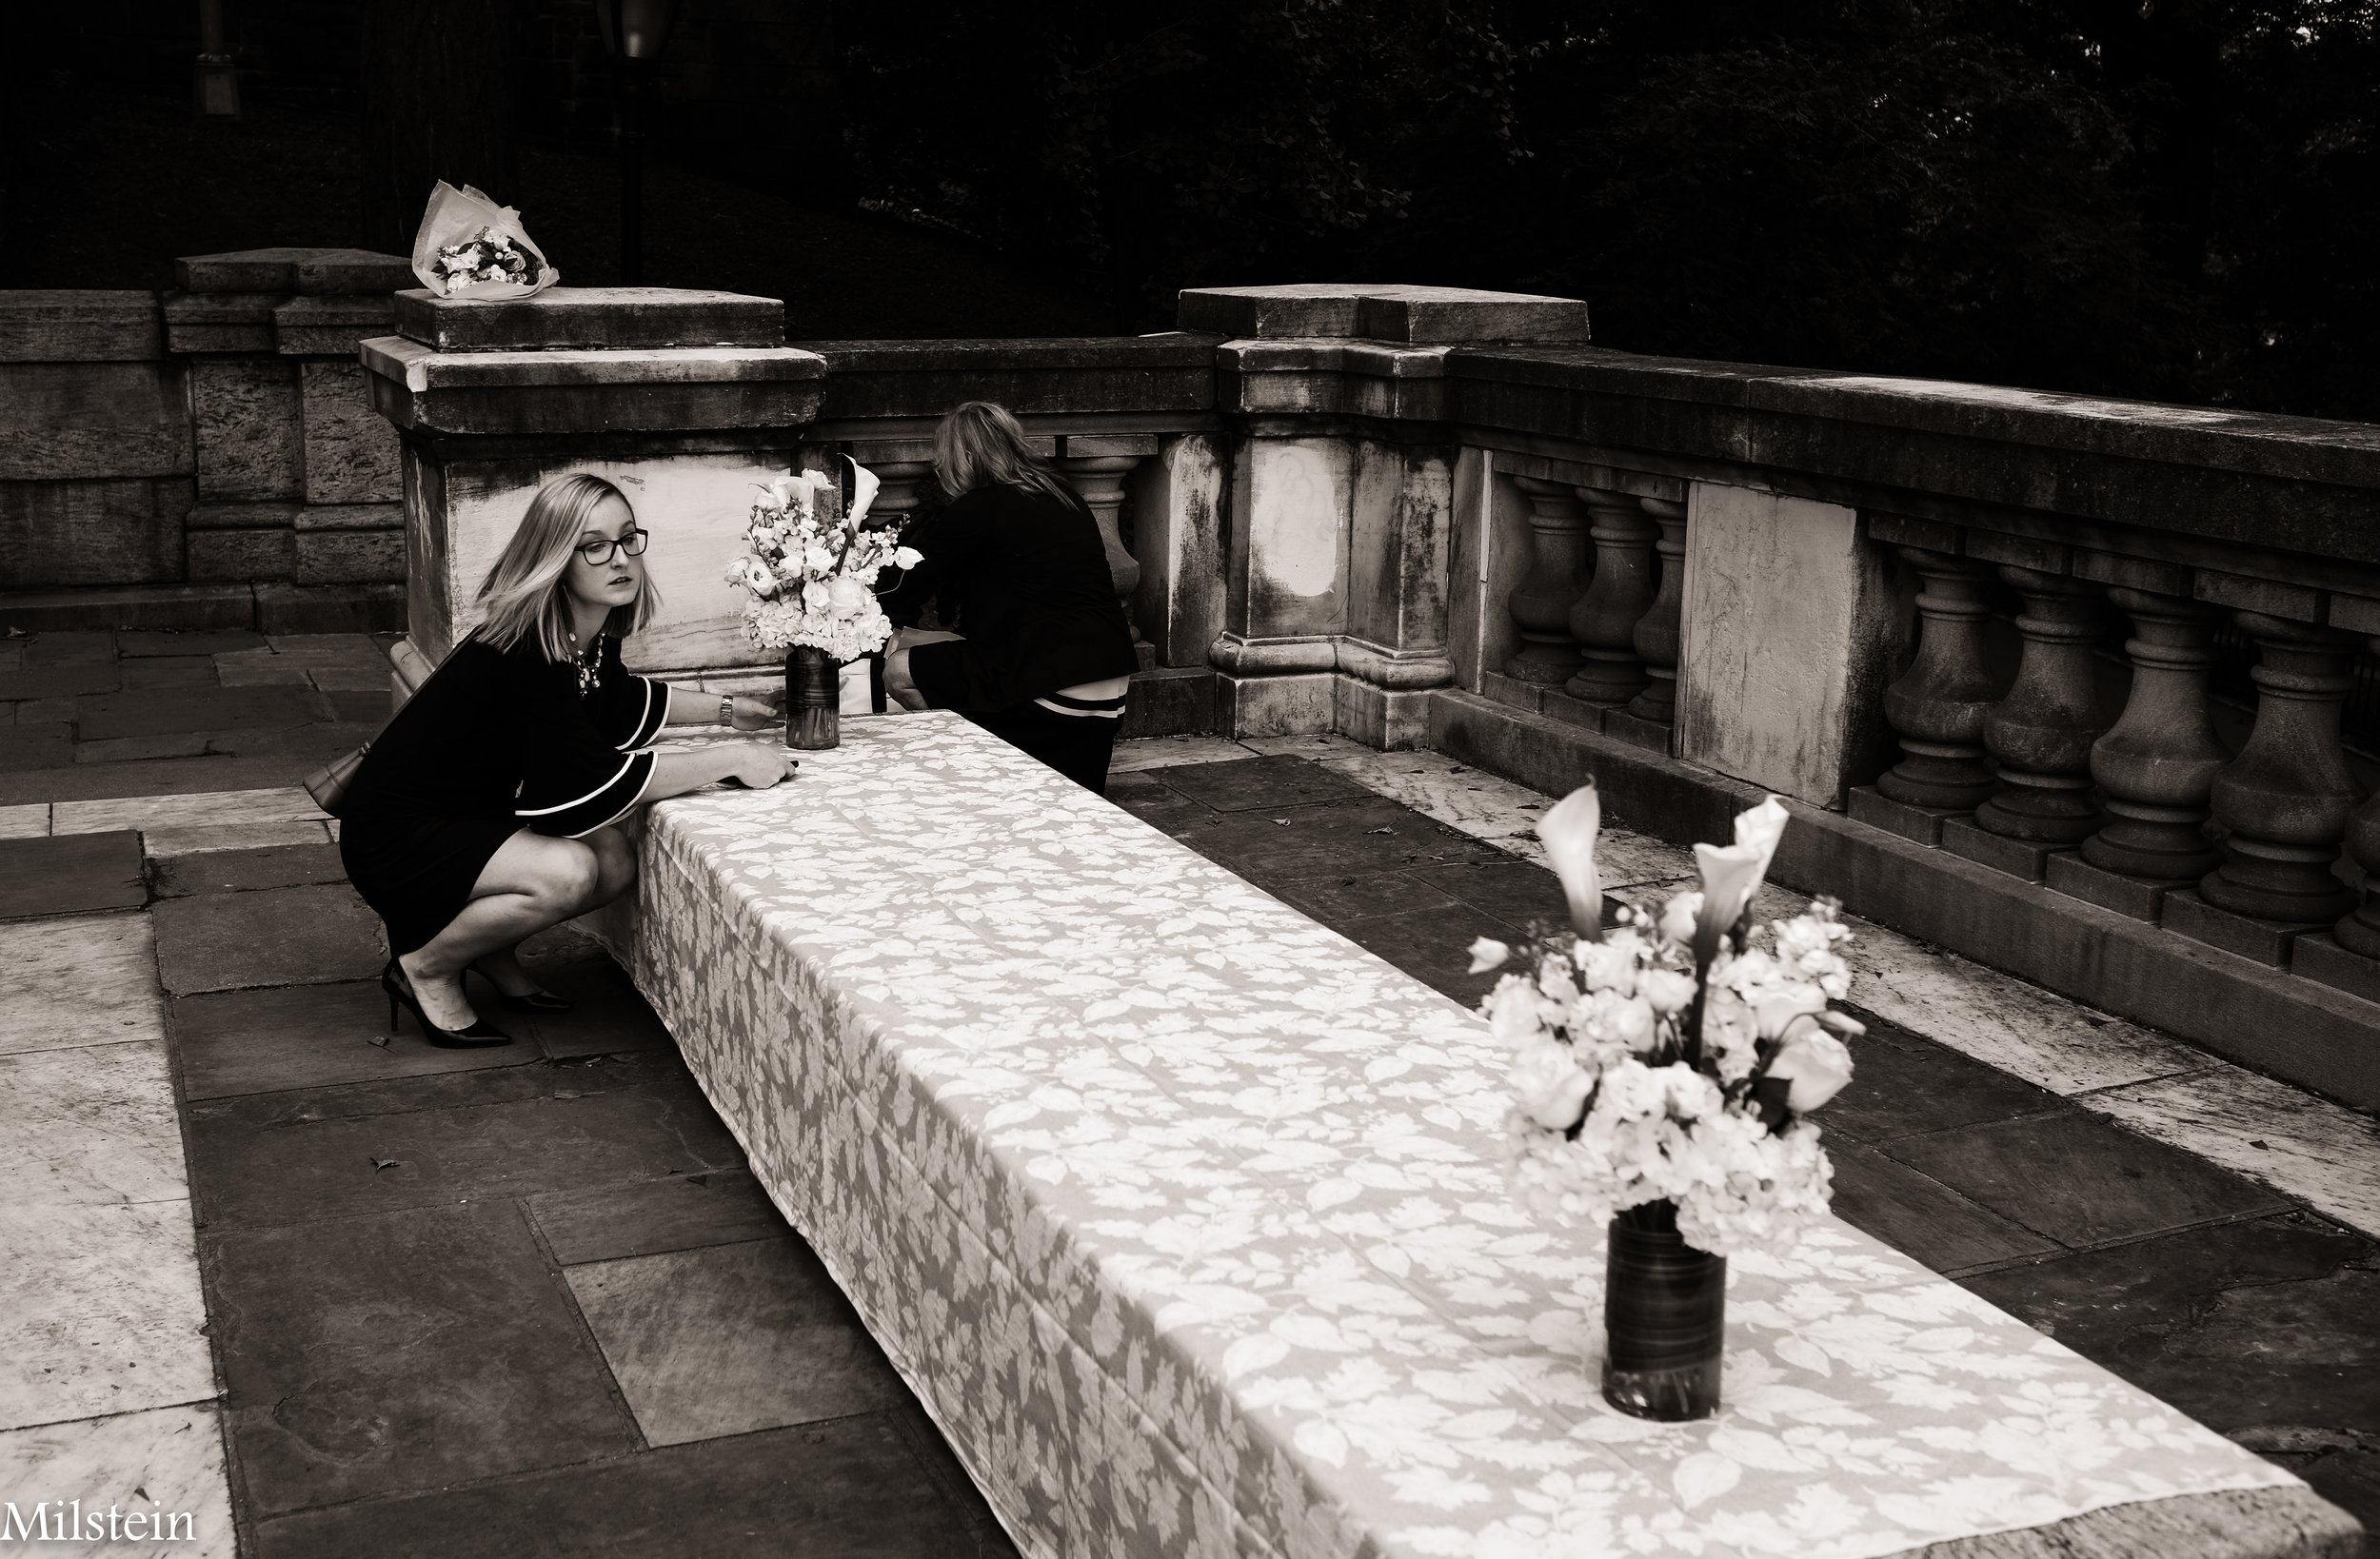 Amy-Milstein-documentary-wedding-photography-New-York.jpg